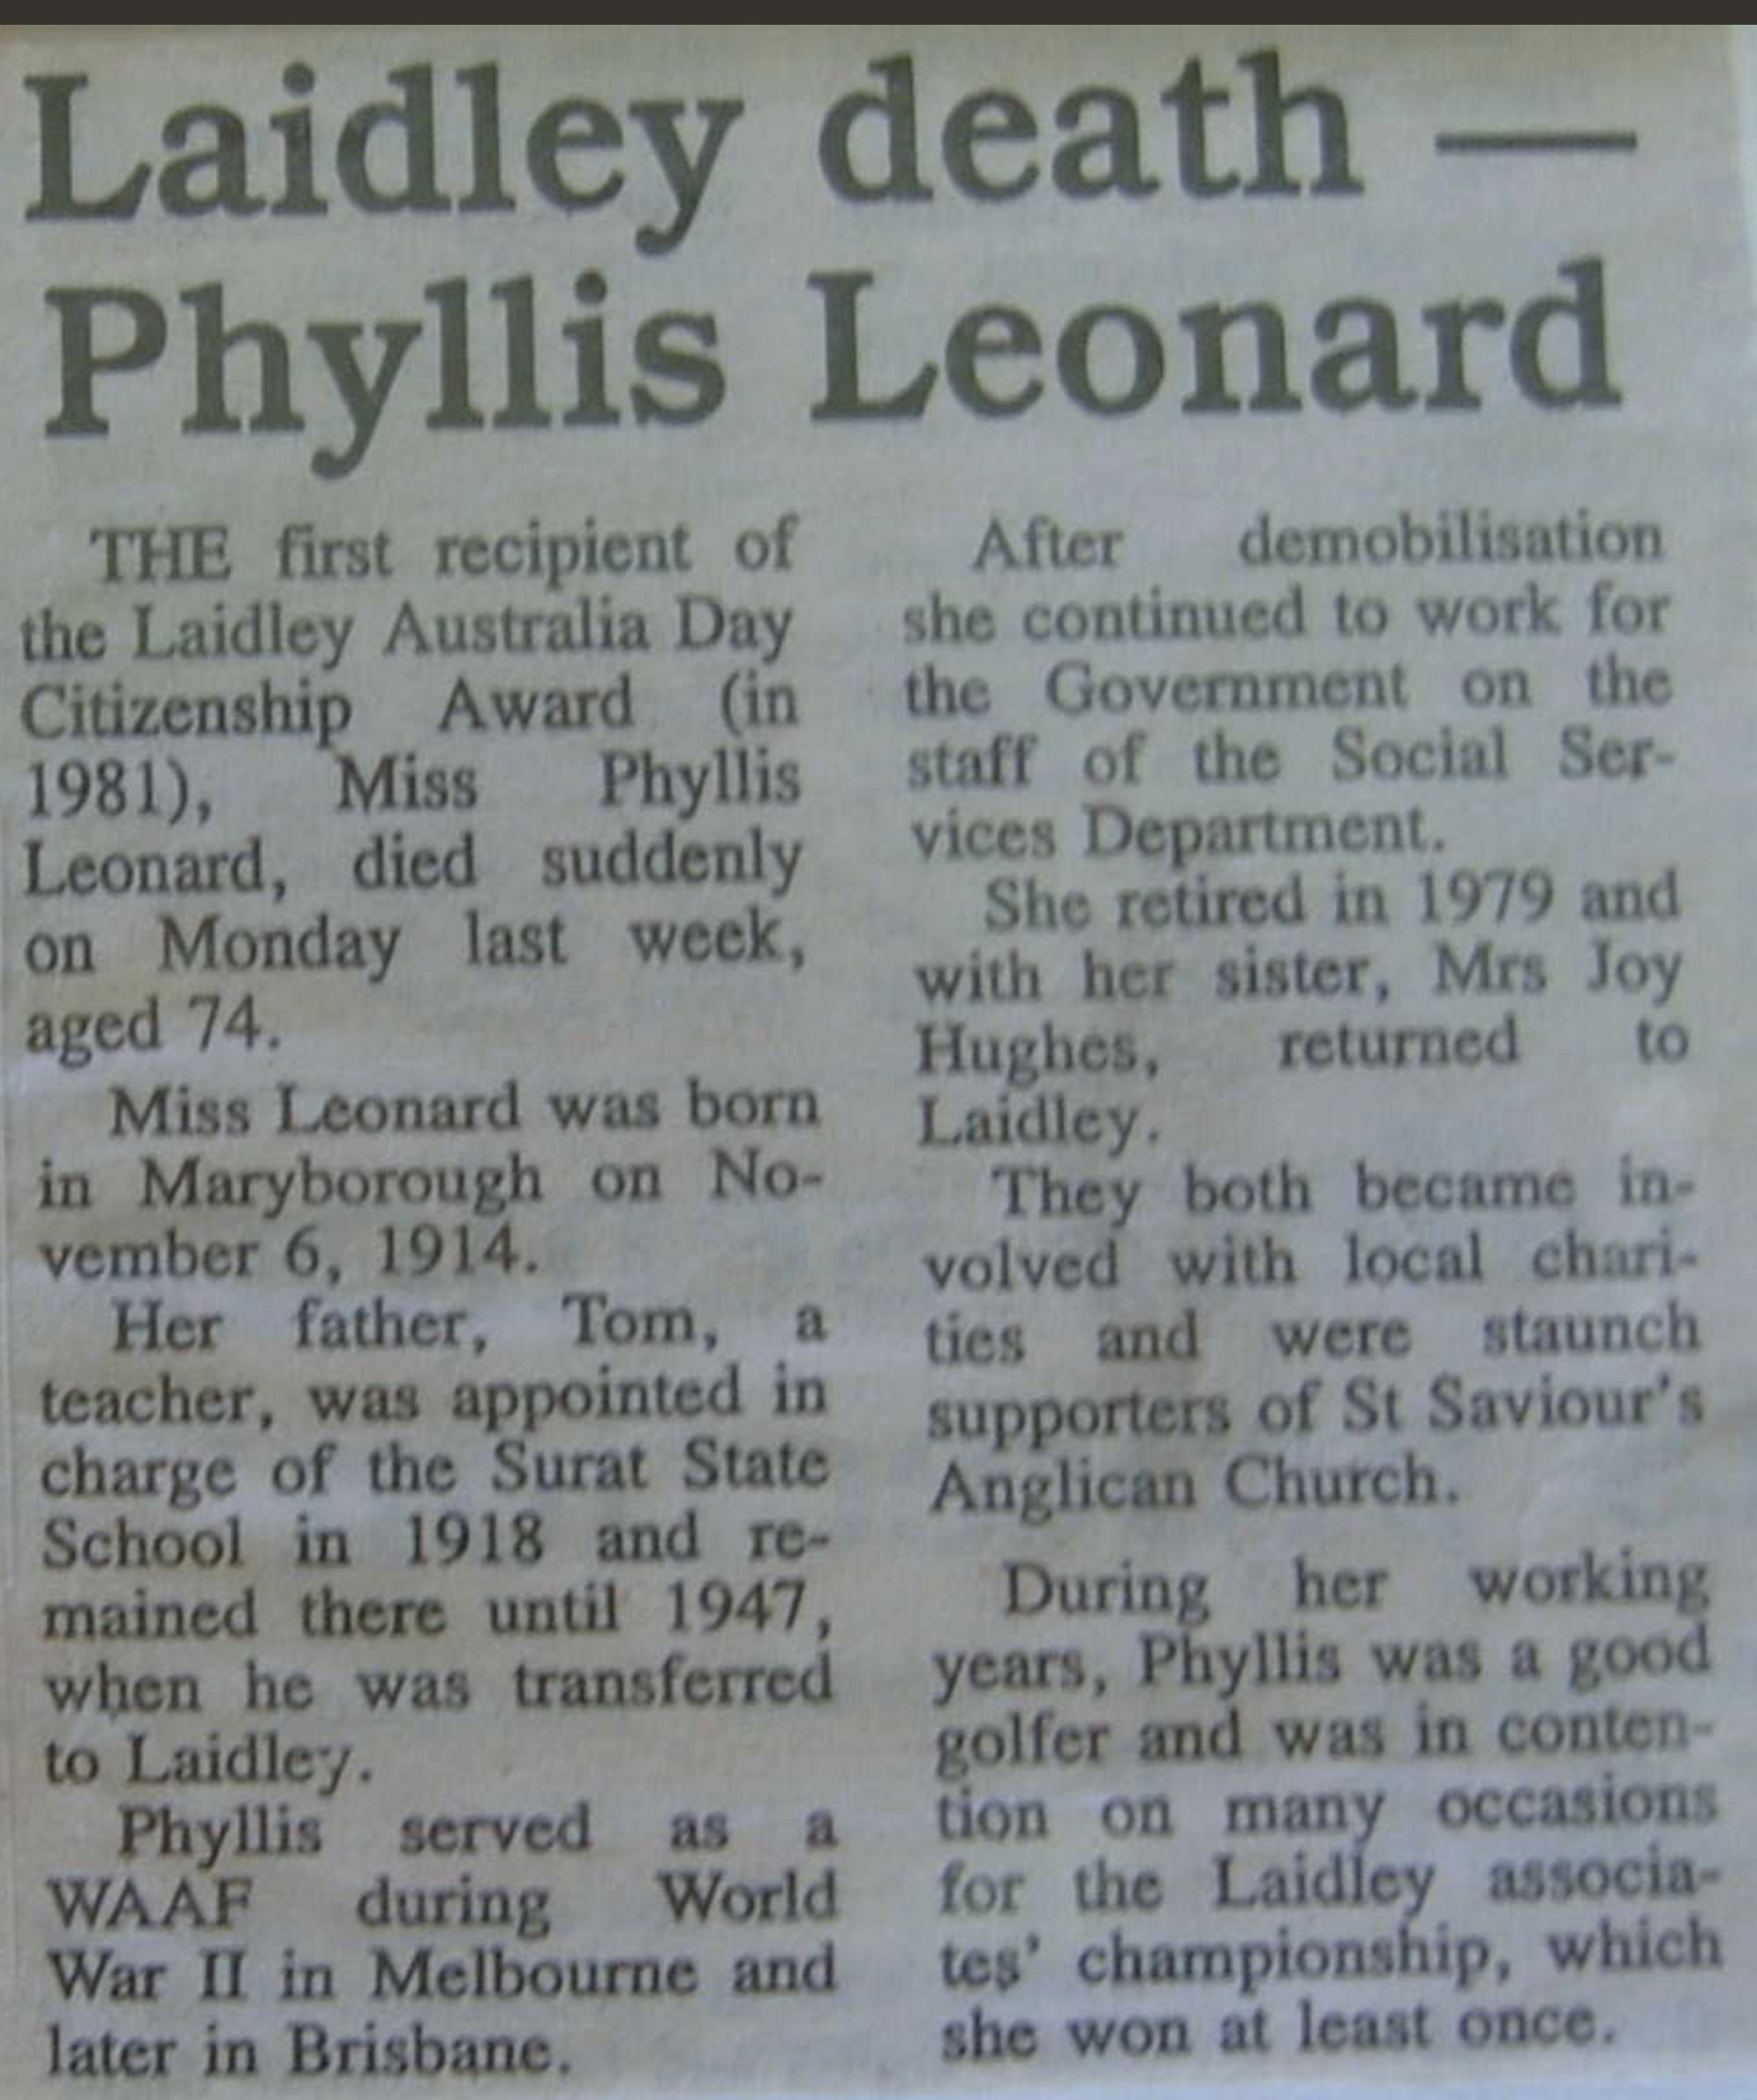 Sydney Leonard